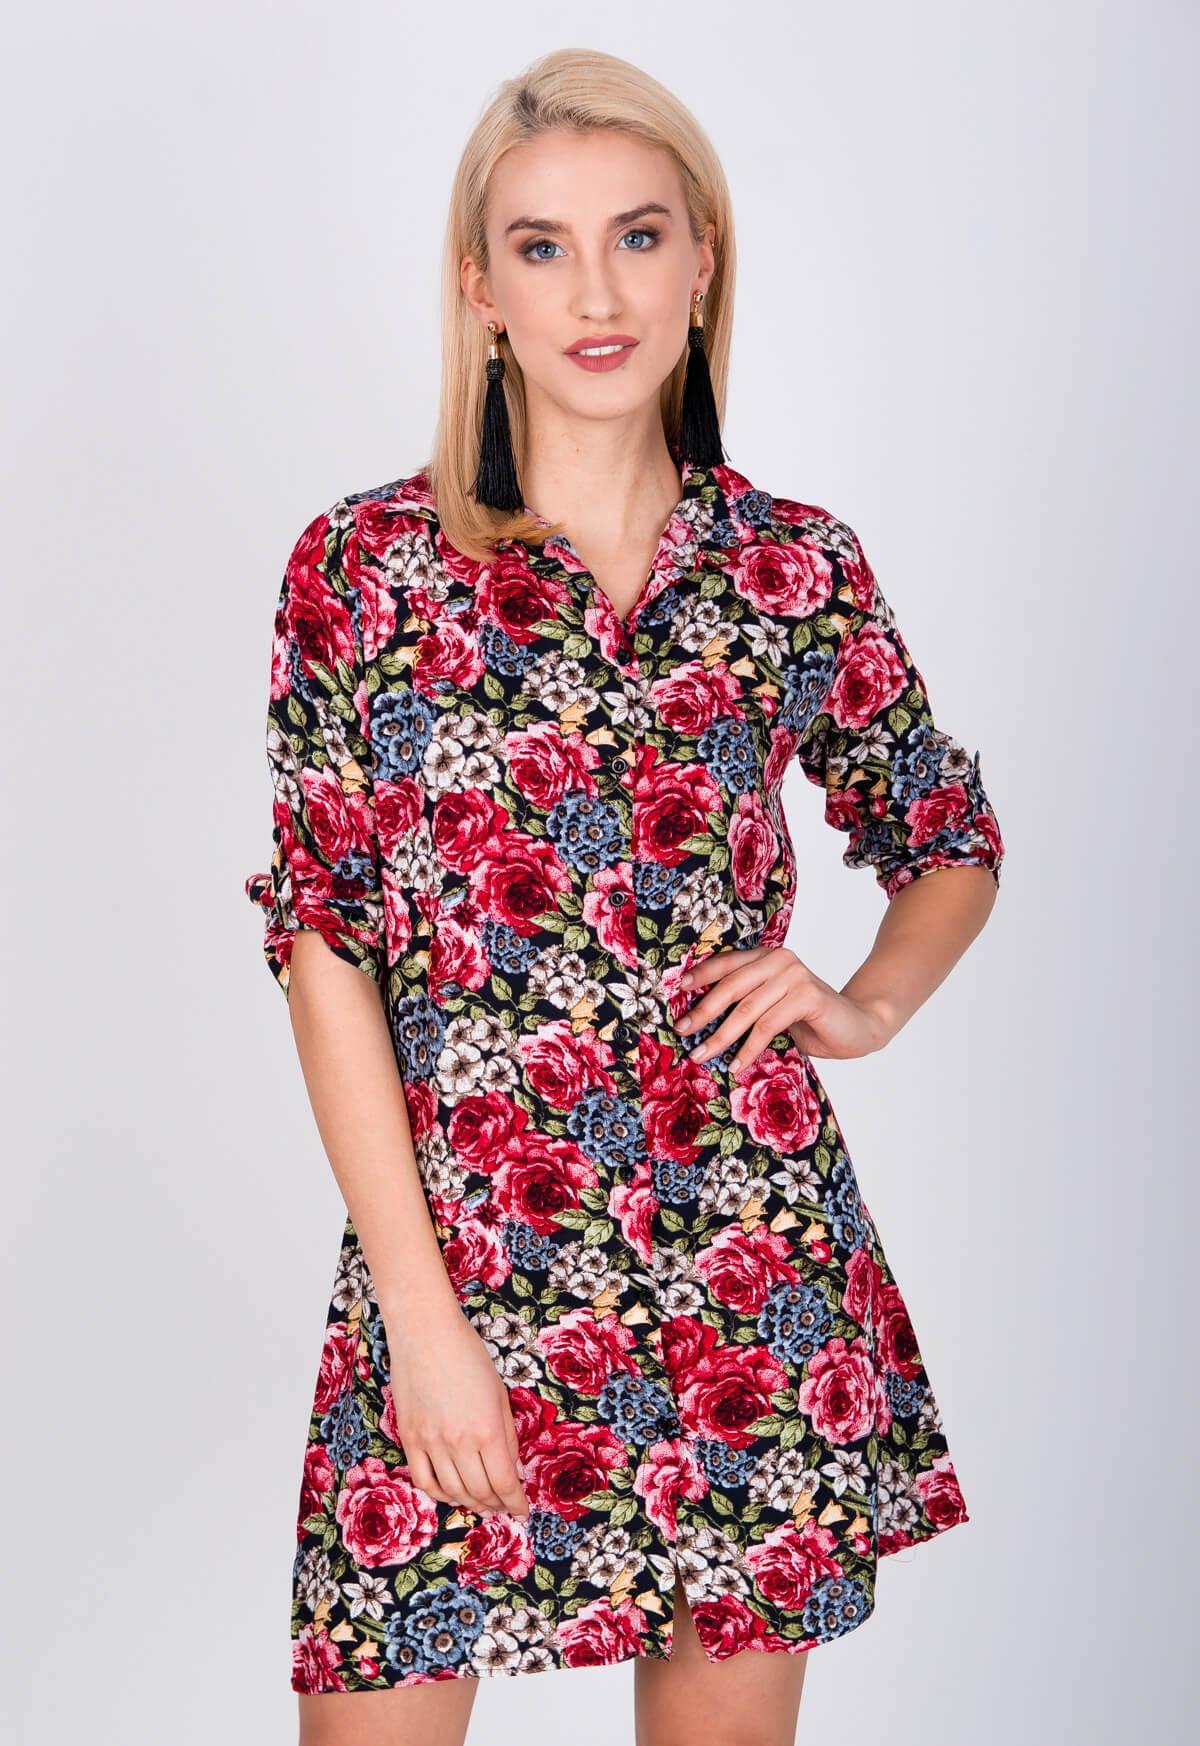 193b59a77e91 Dámské košilové šaty K34 - ZOiO červená